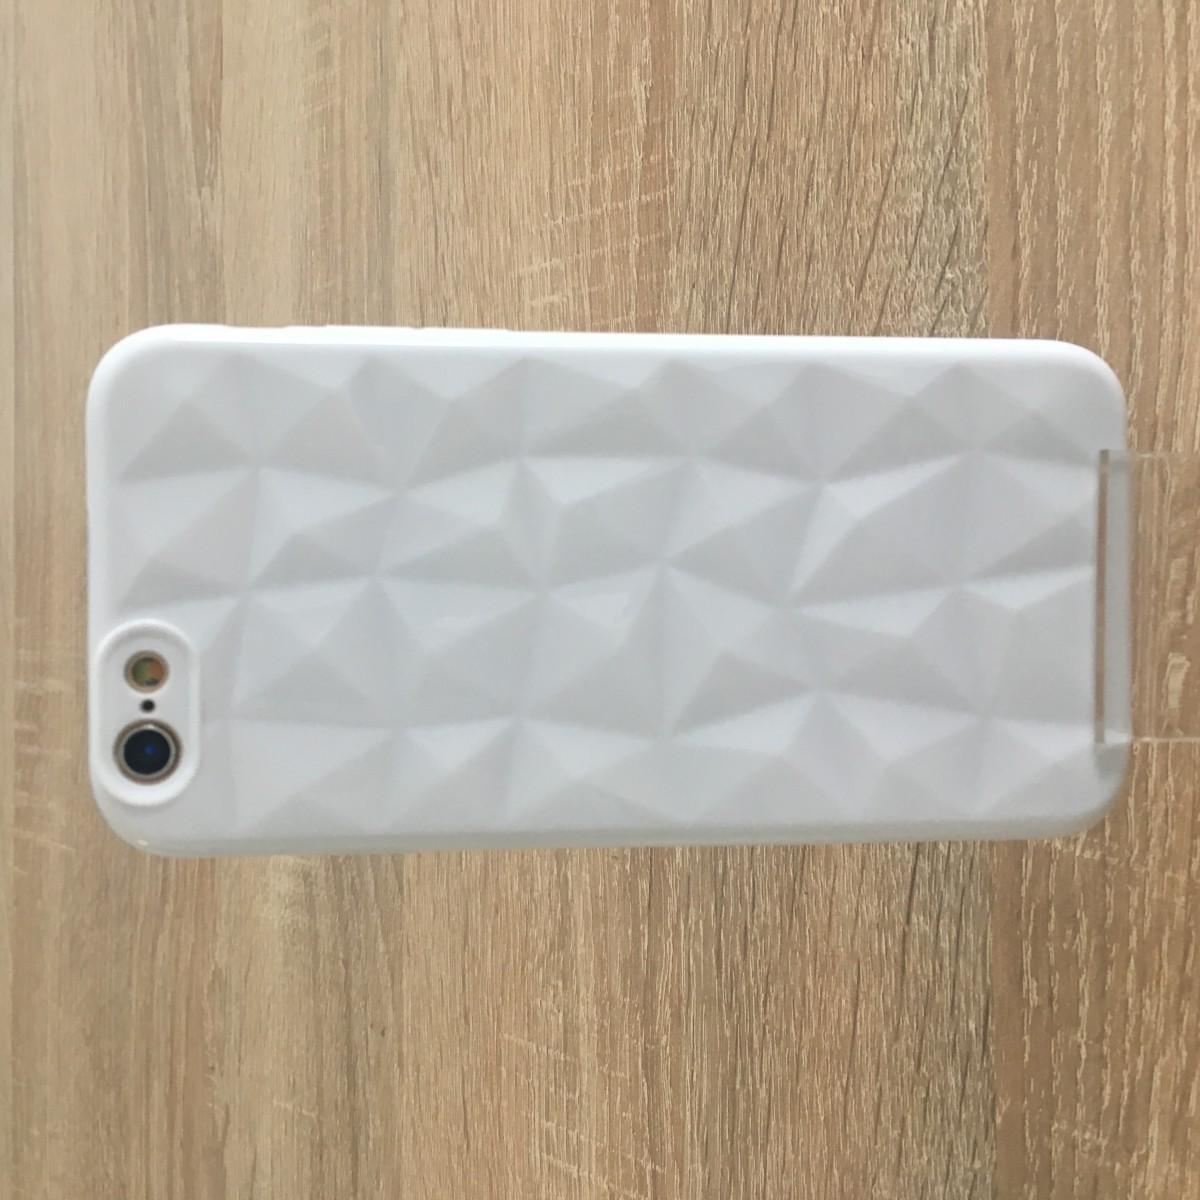 Pouzdro iMore Prism pro Apple iPhone 6s / 6 - bílé